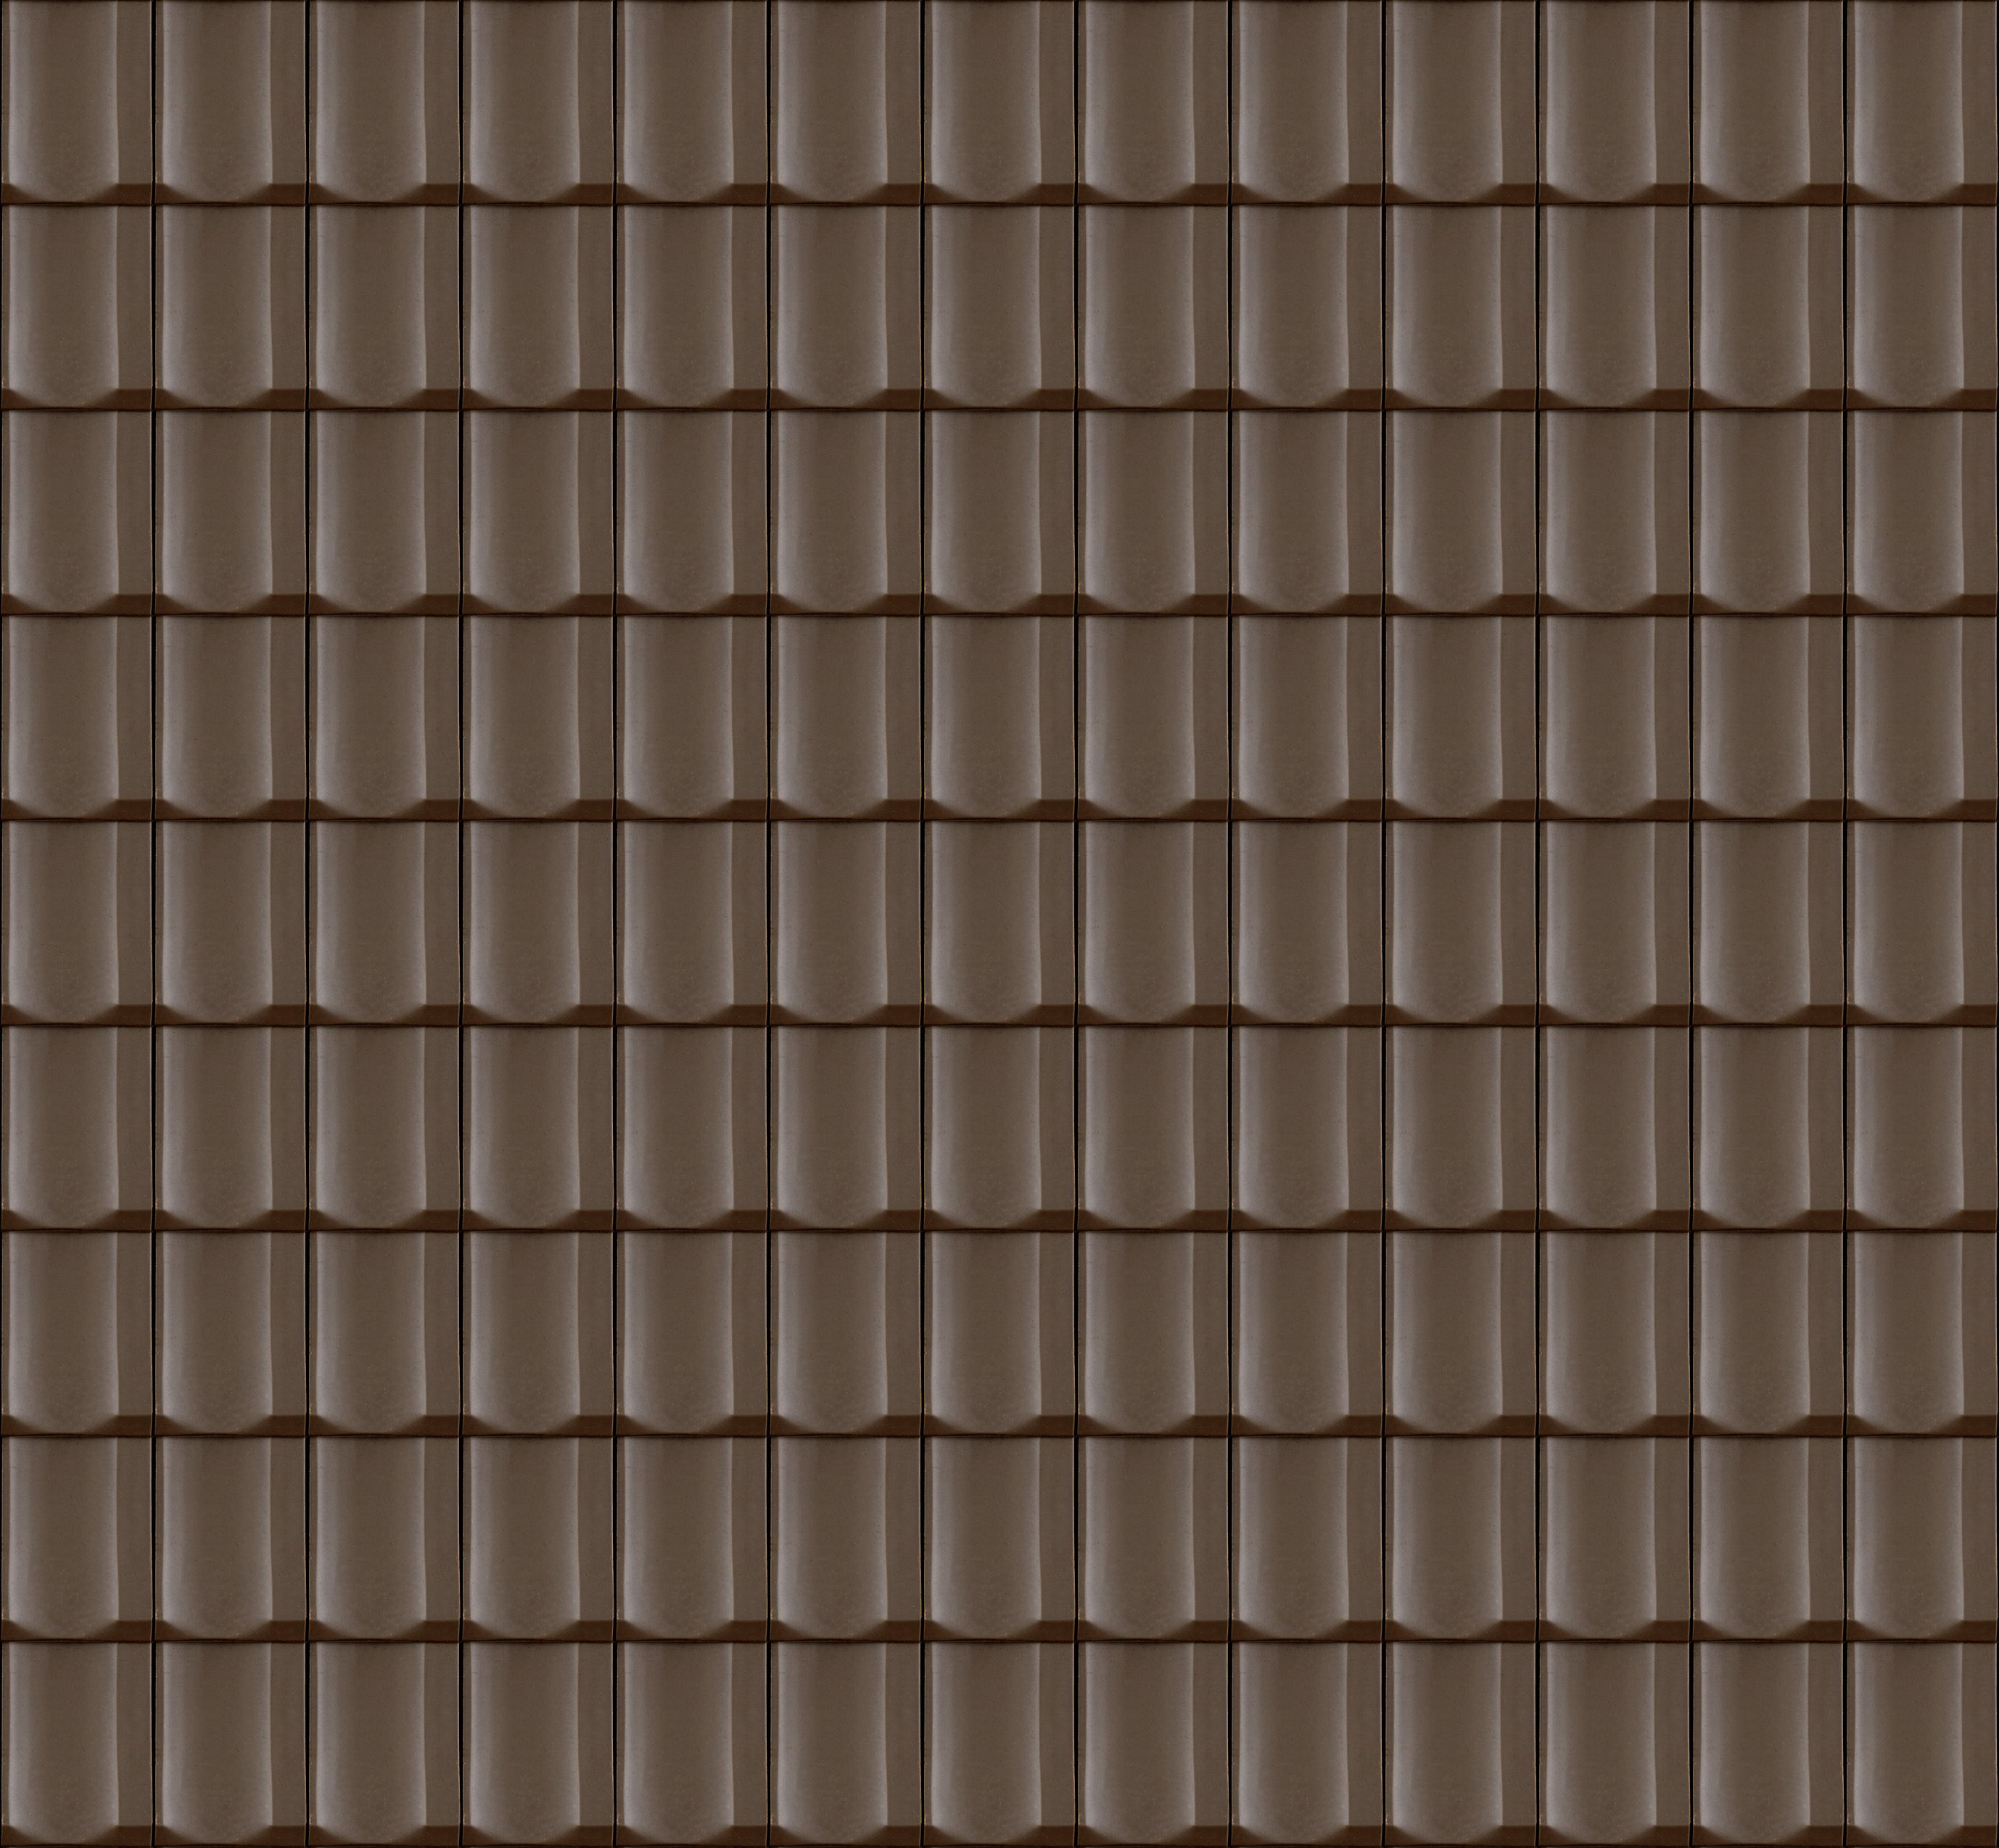 Free Tiles Texture Roof Texture8 Metal Roof Zinc Roof Roofing